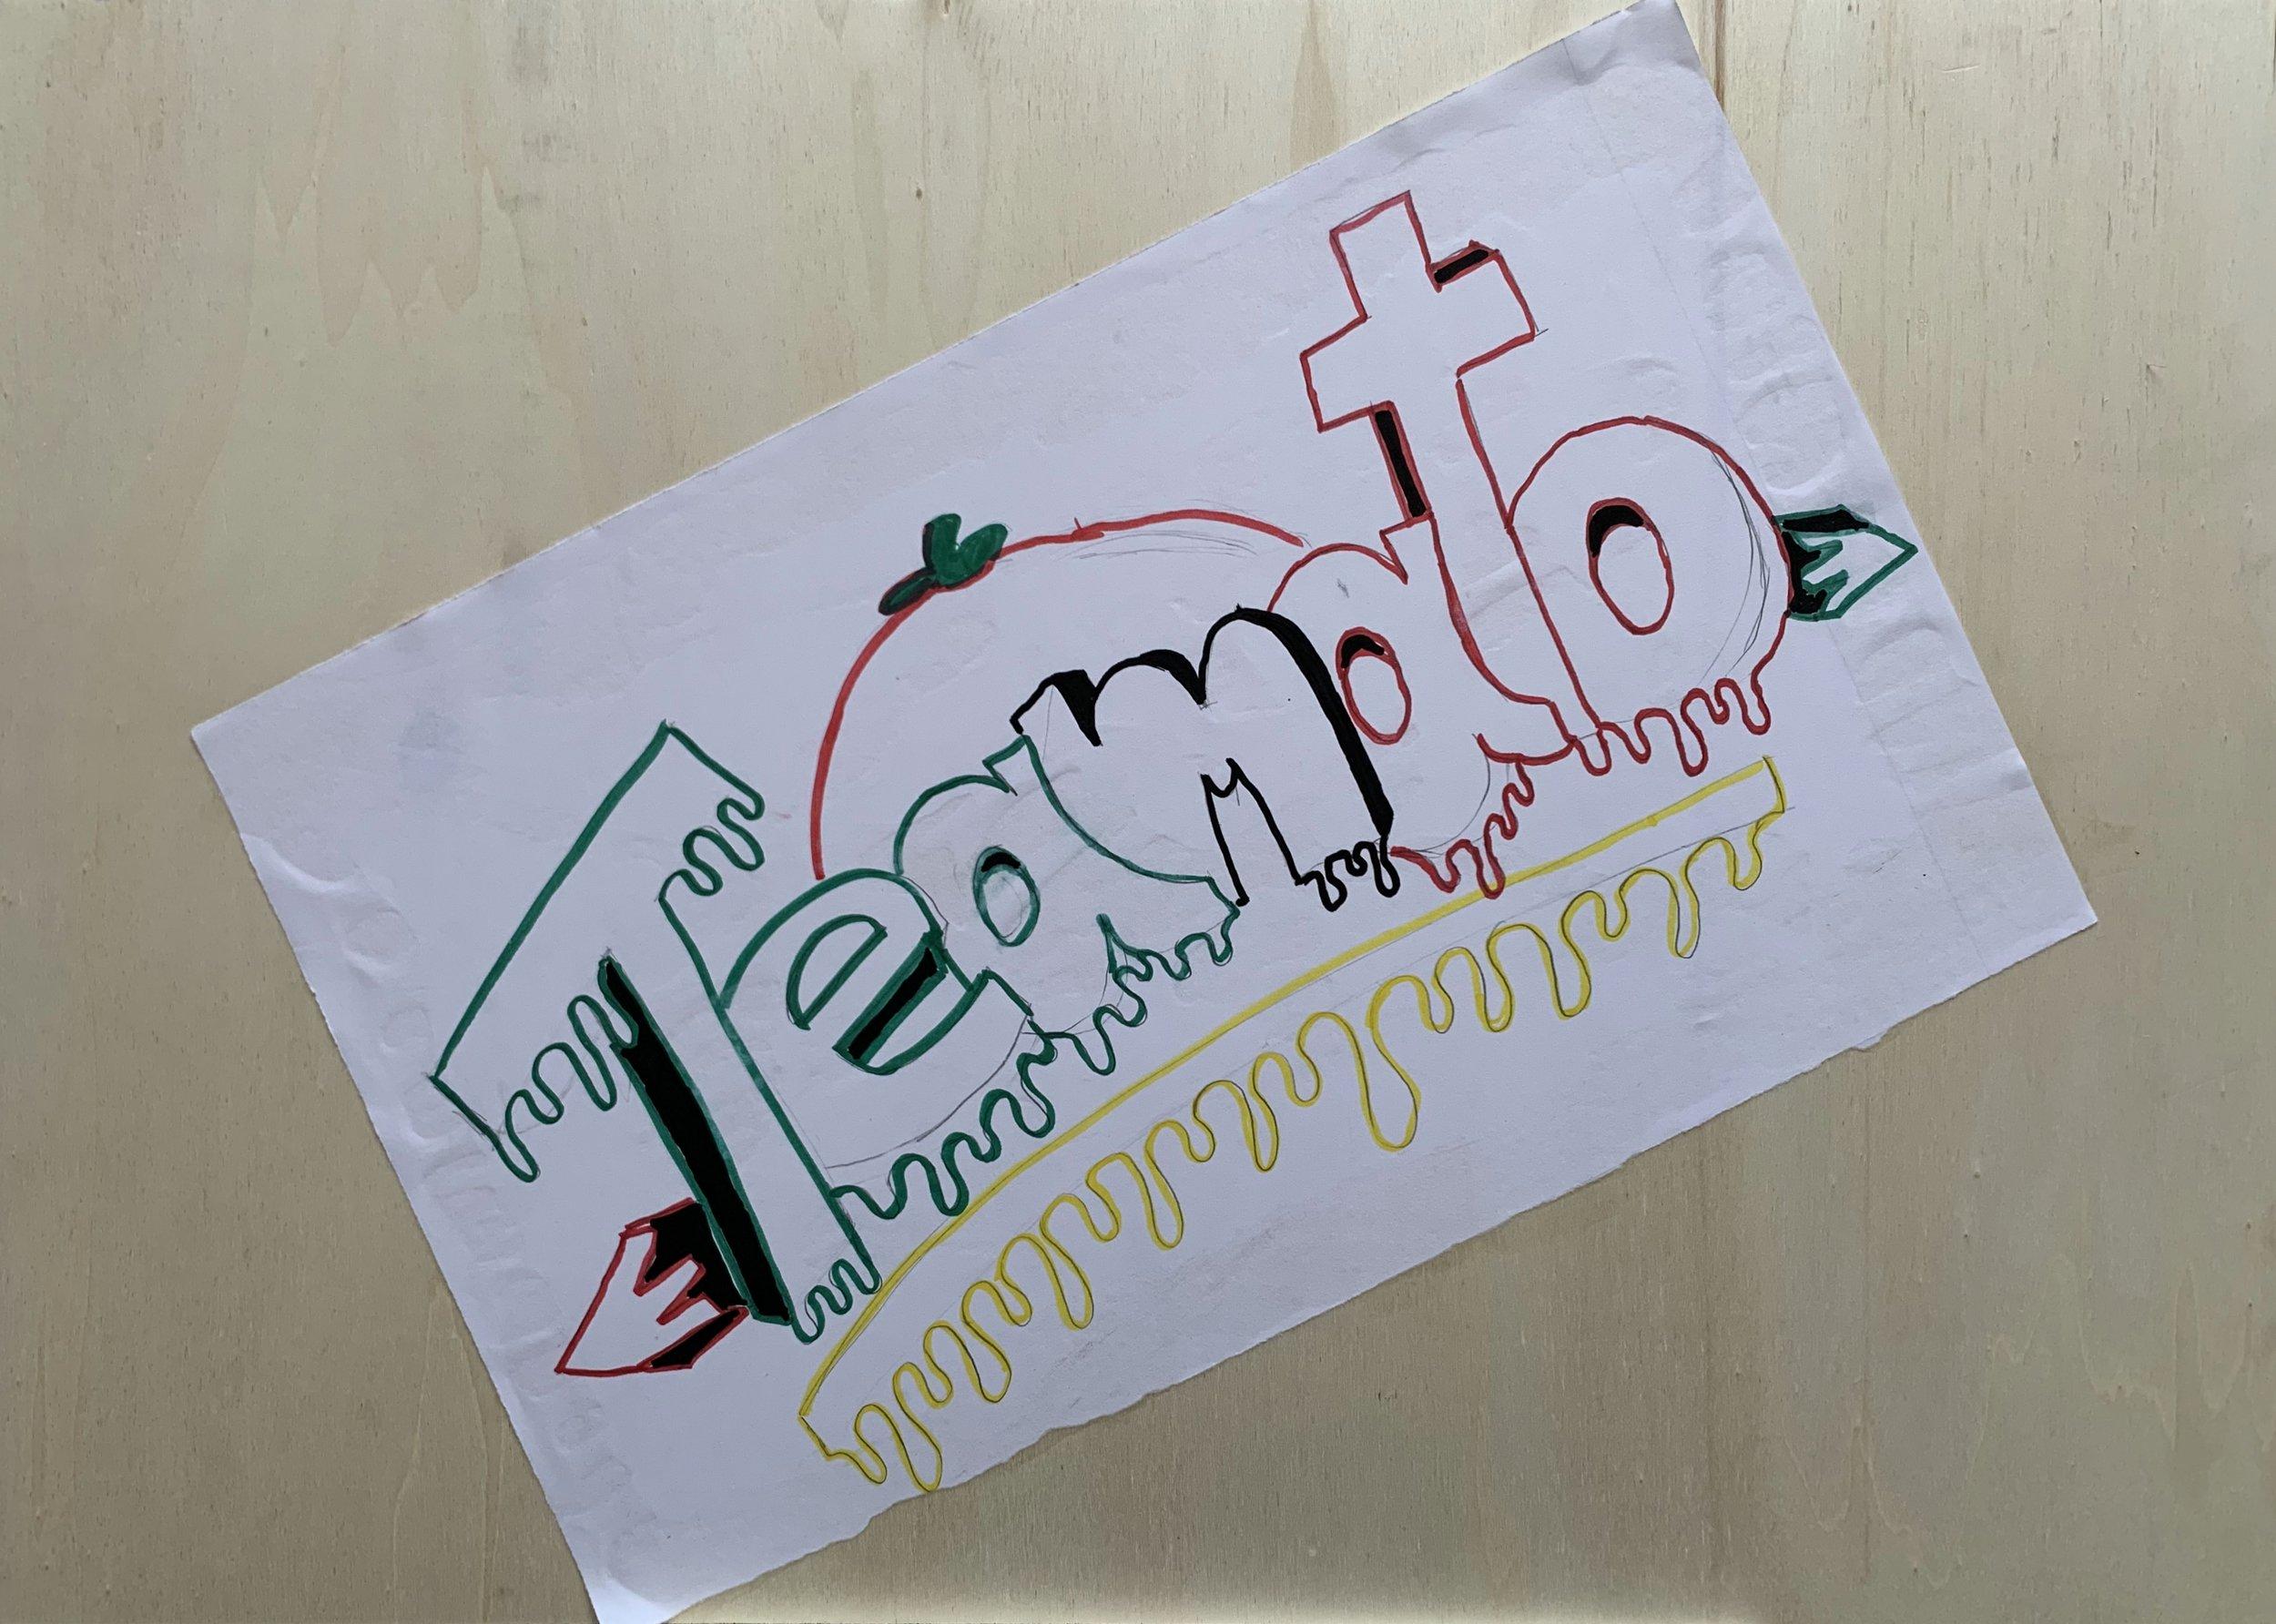 Teamato - Francesco